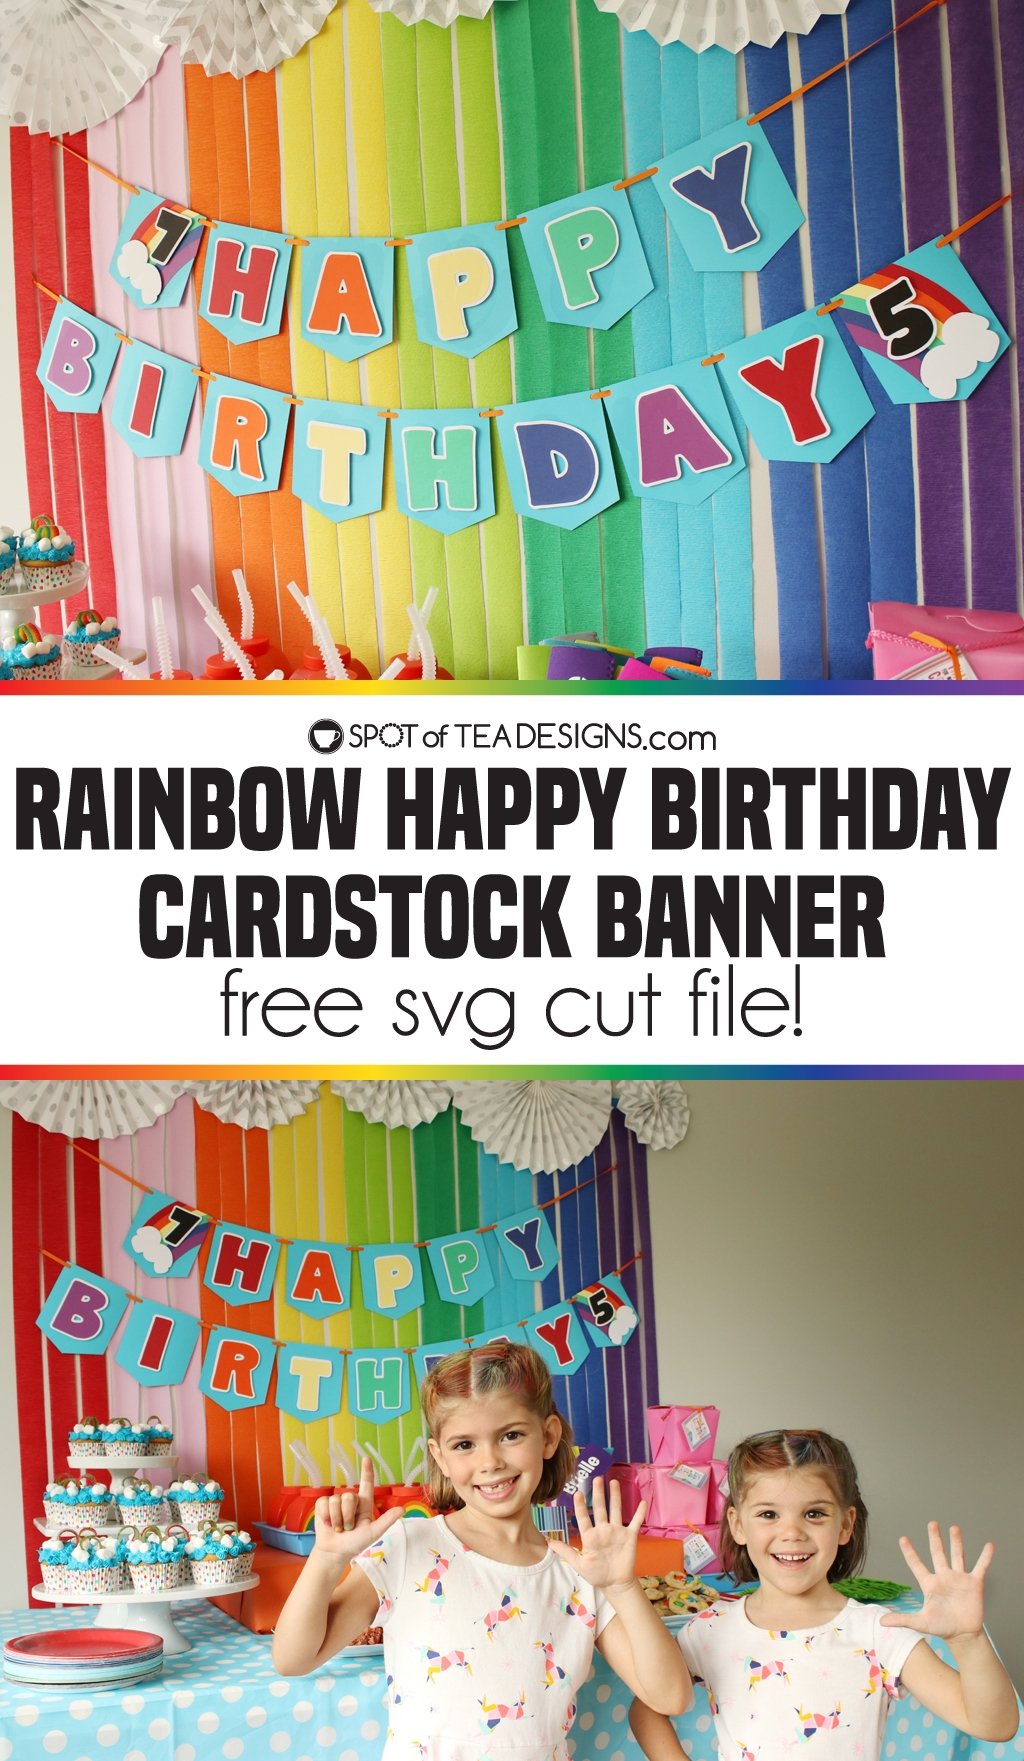 Rainbow Happy Birthday Cardstock Banner with free SVG cut file | spotofteadesigns.com